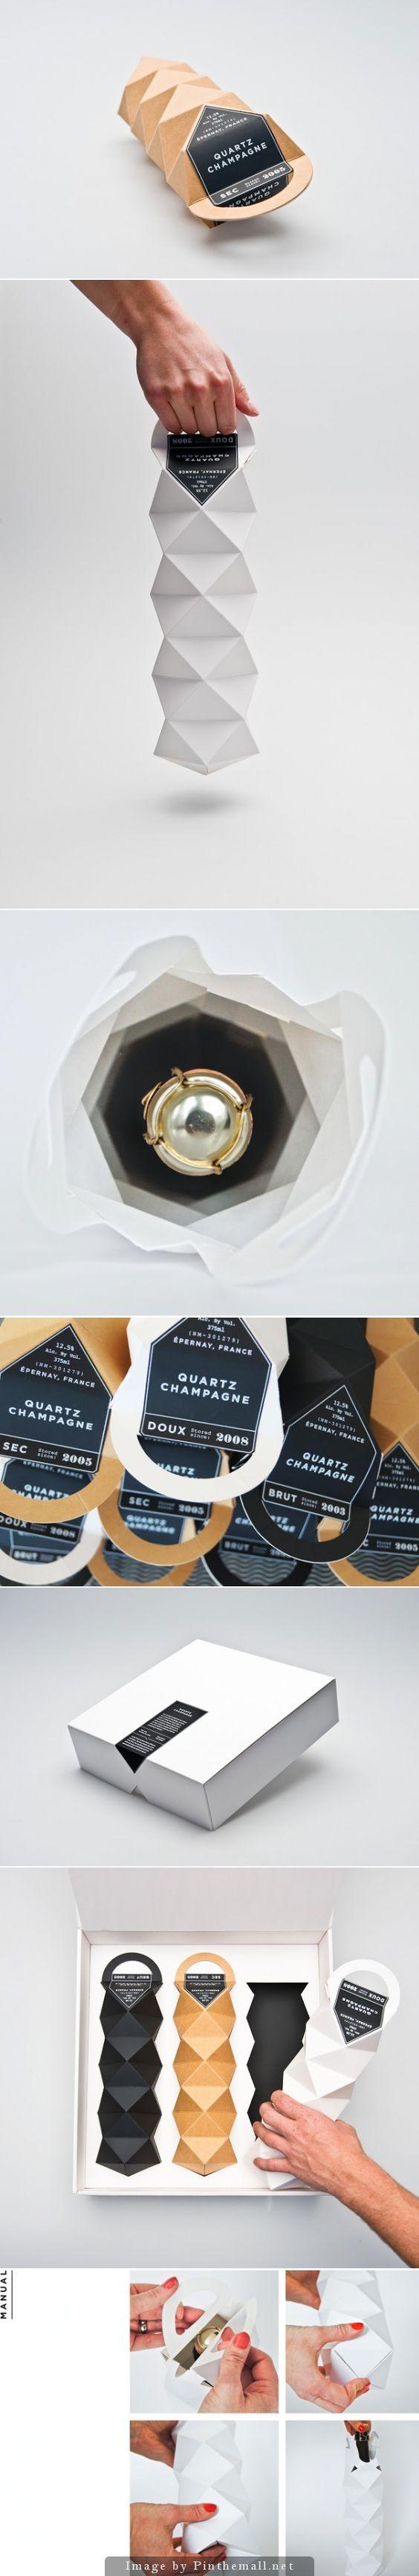 [Inspirations du Studio] - Quartz Champagne by Max Molitor & Cajza Nyden - #création #imagination